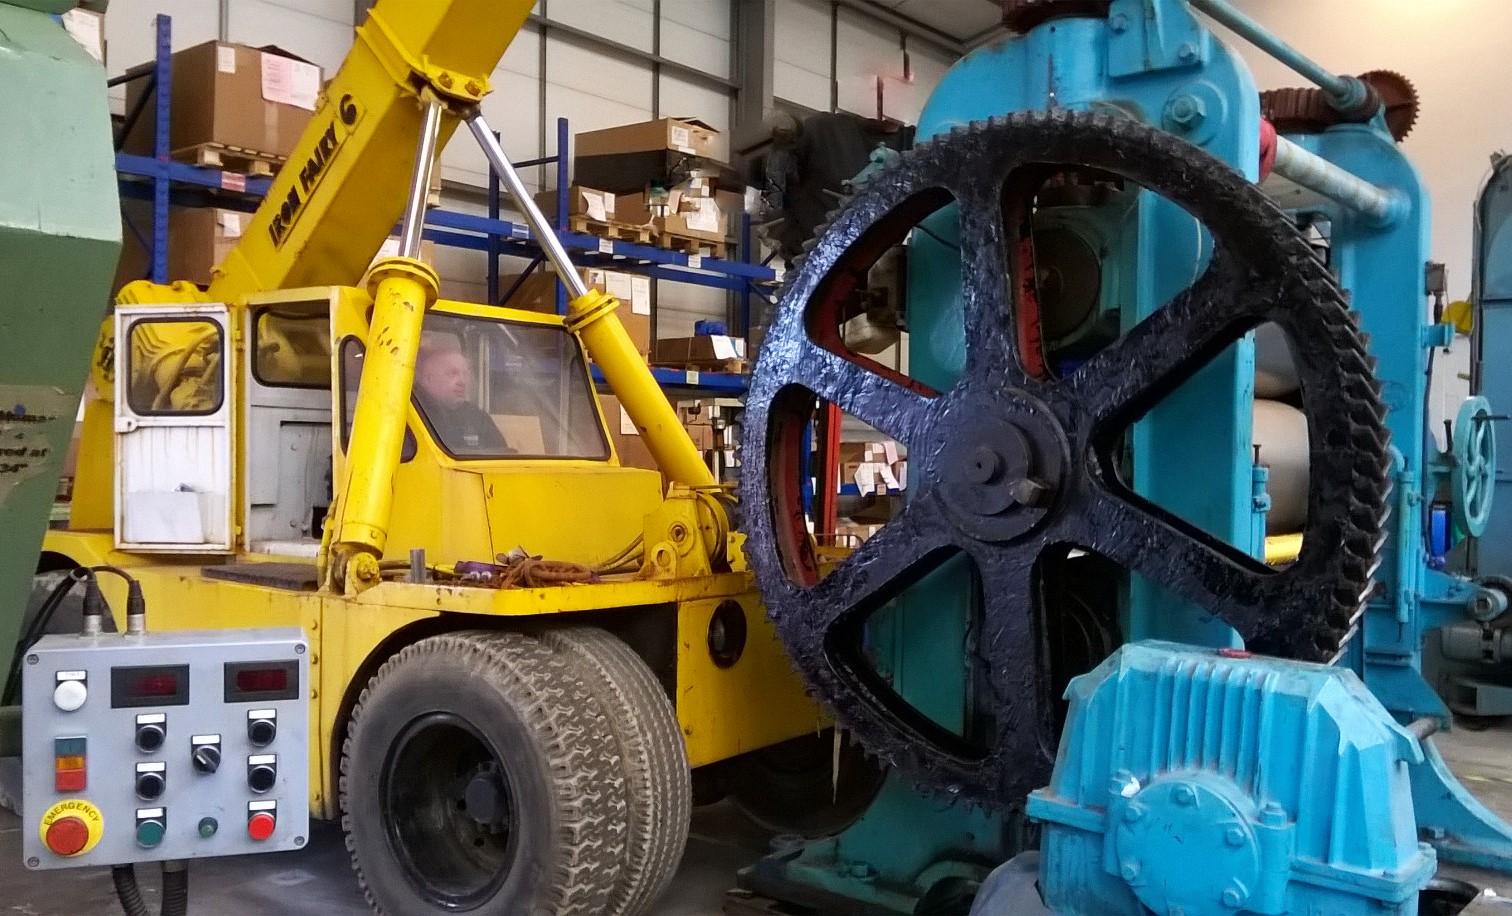 Trojan-Mek Machinery Moving & Plant Decommissioning